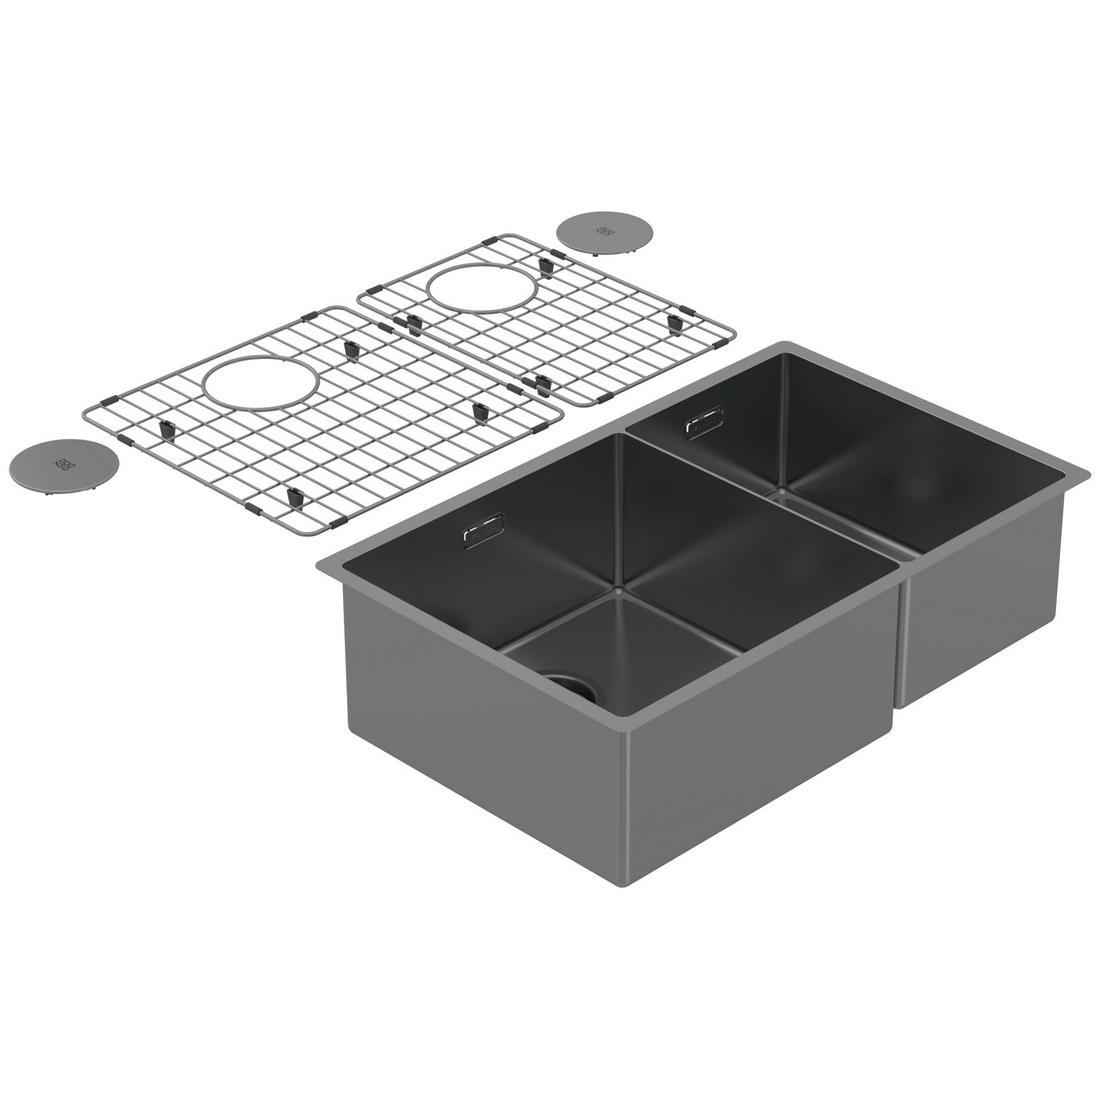 704x440x200mm Double Bowl Undermount Kitchen Sink Cayman Sonic Grey PearlArc Finish